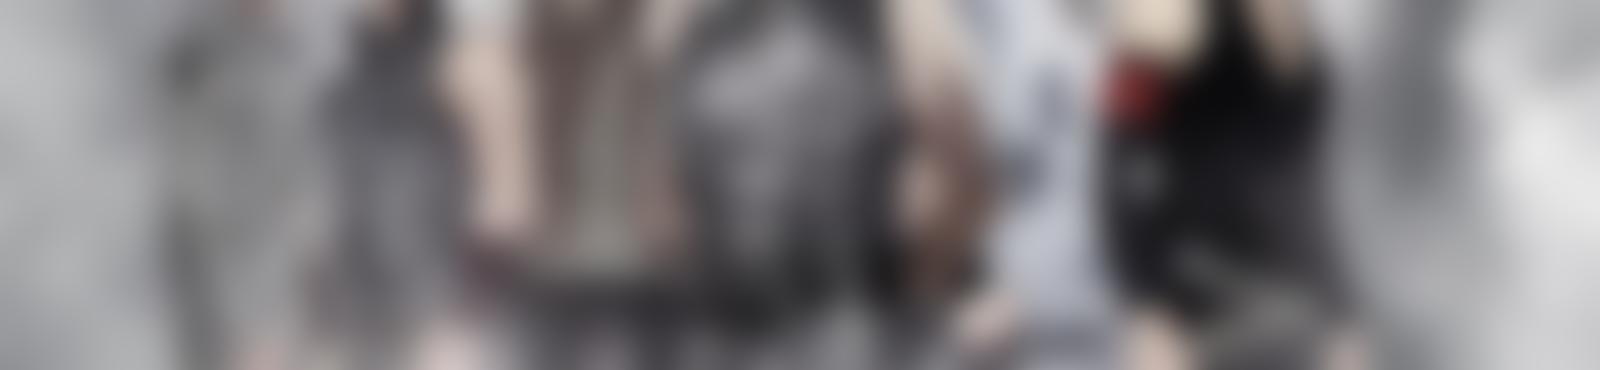 Blurred e1e601c8 d9ad 4ae3 9096 c41b74d89825